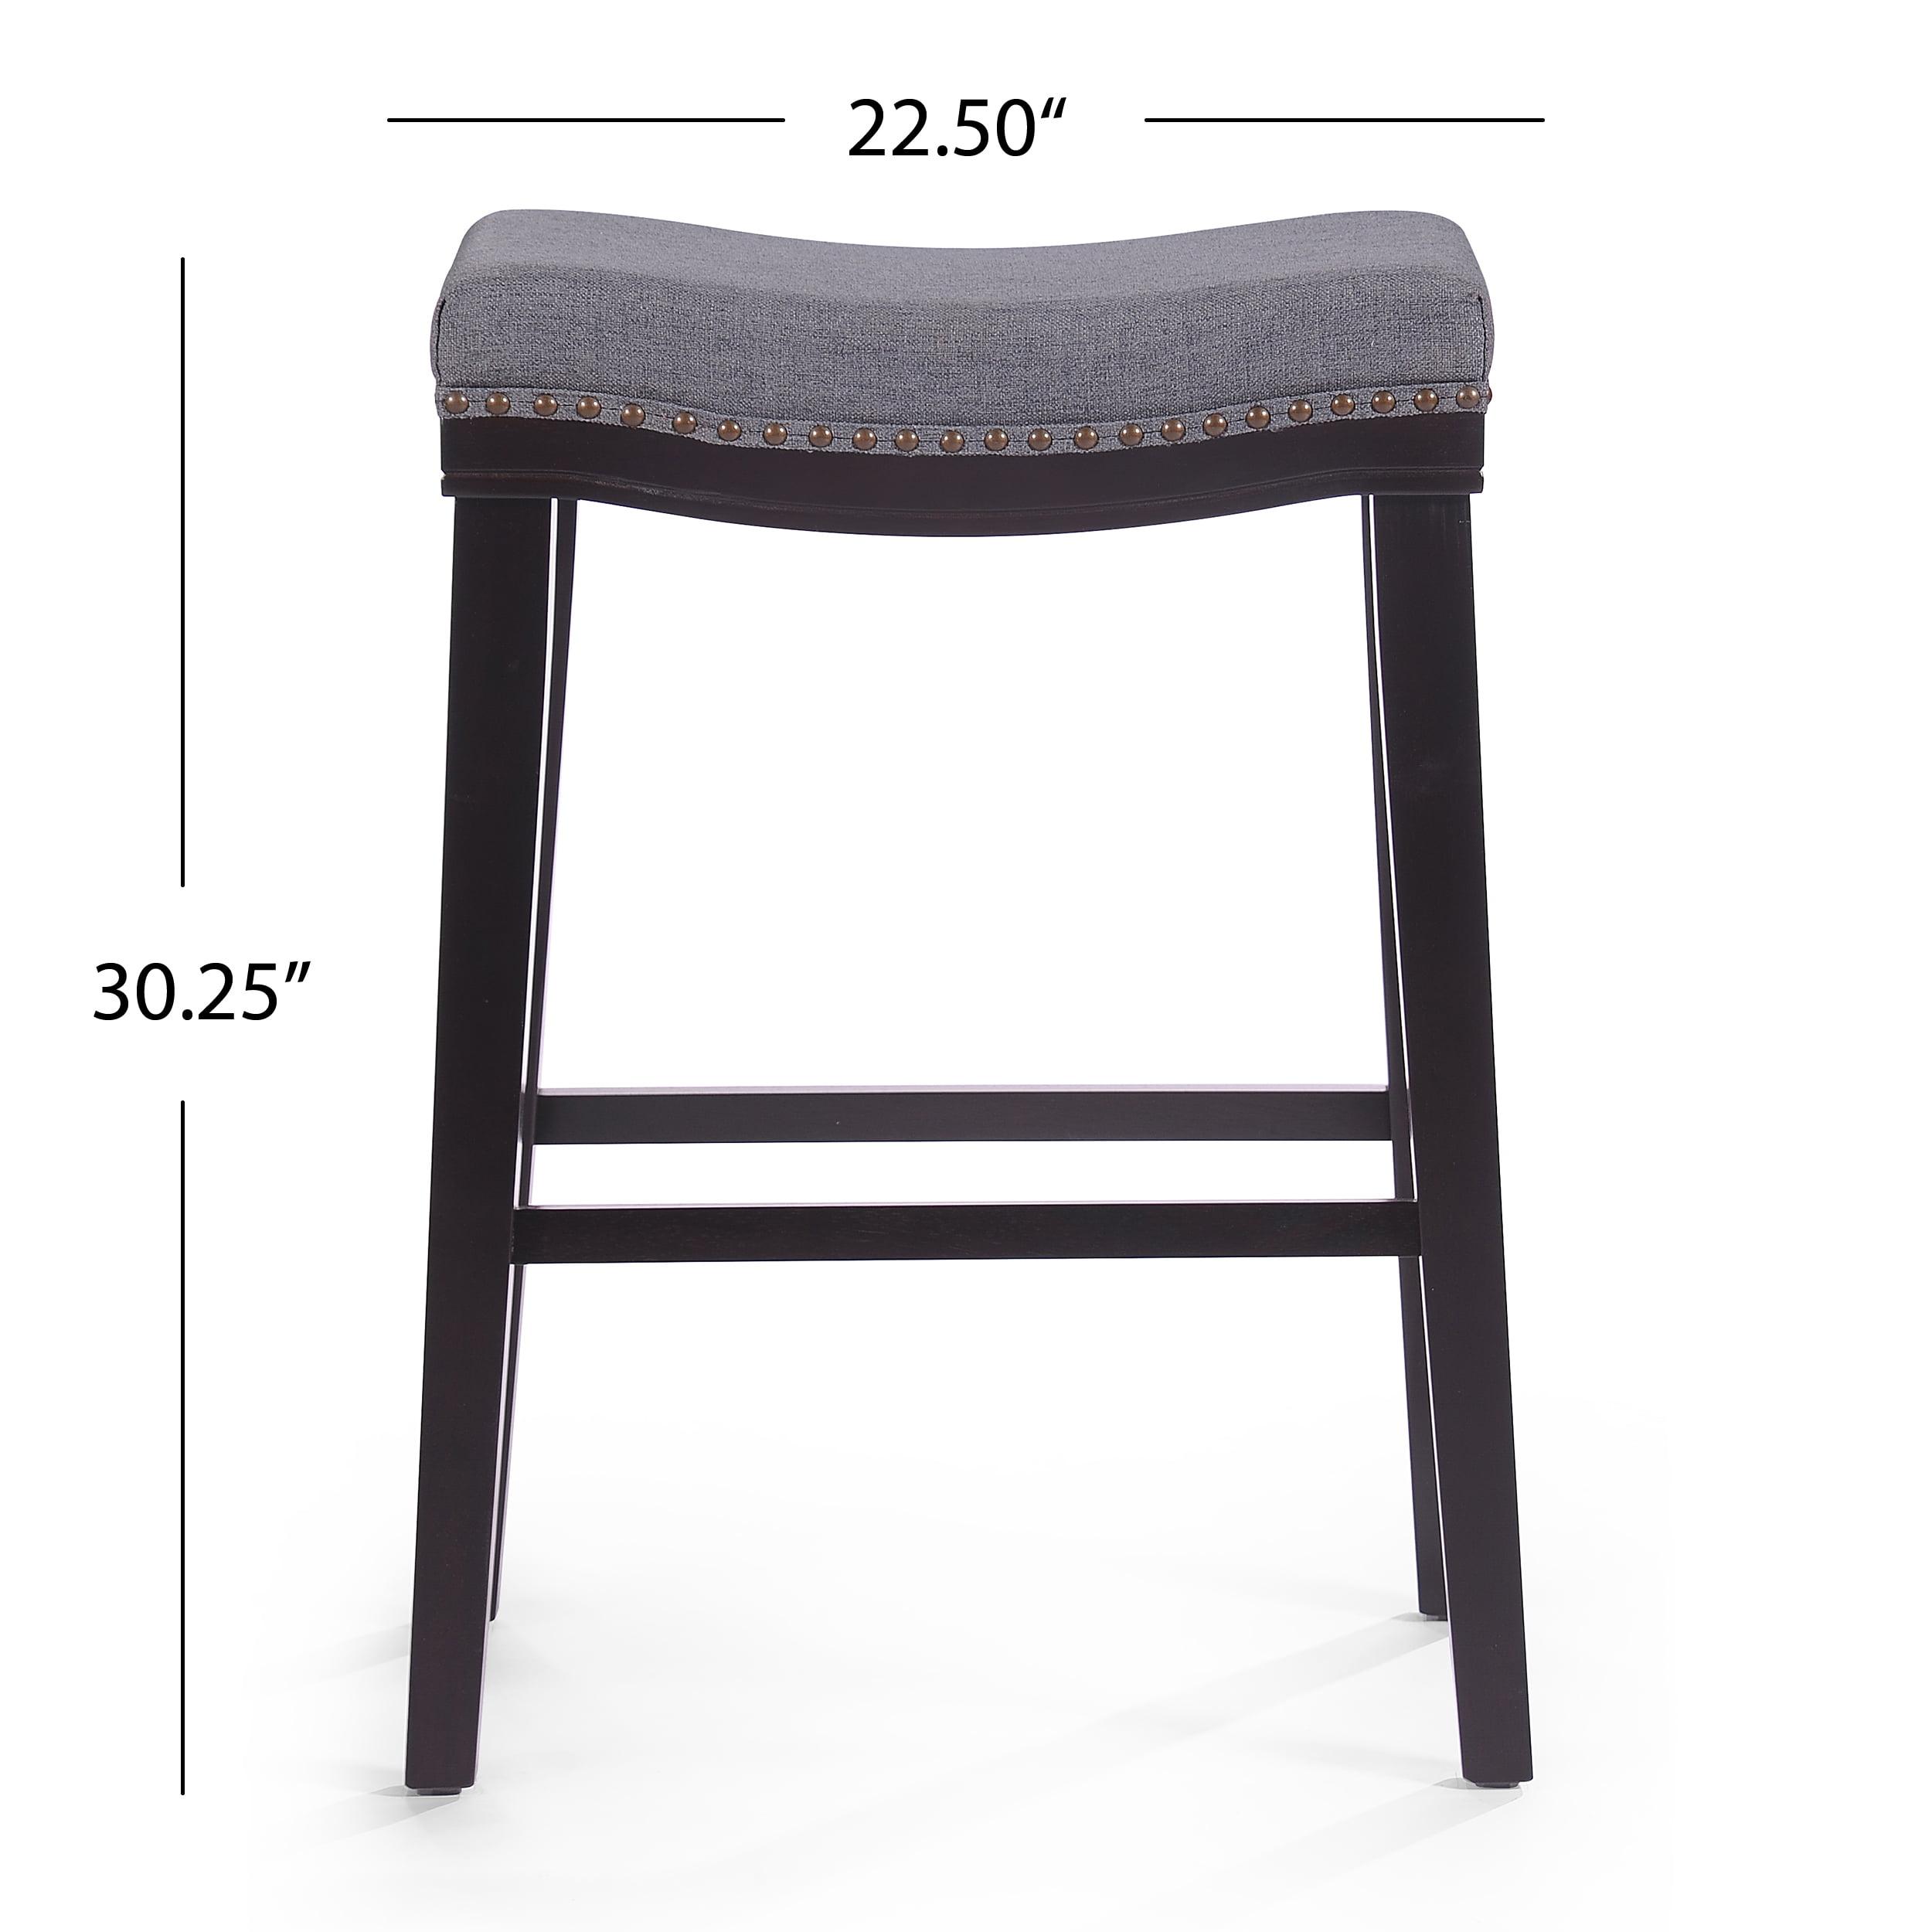 Peachy Rosalie Fabric Saddle Stool Set Of 2 Charcoal Dark Brown Ibusinesslaw Wood Chair Design Ideas Ibusinesslaworg